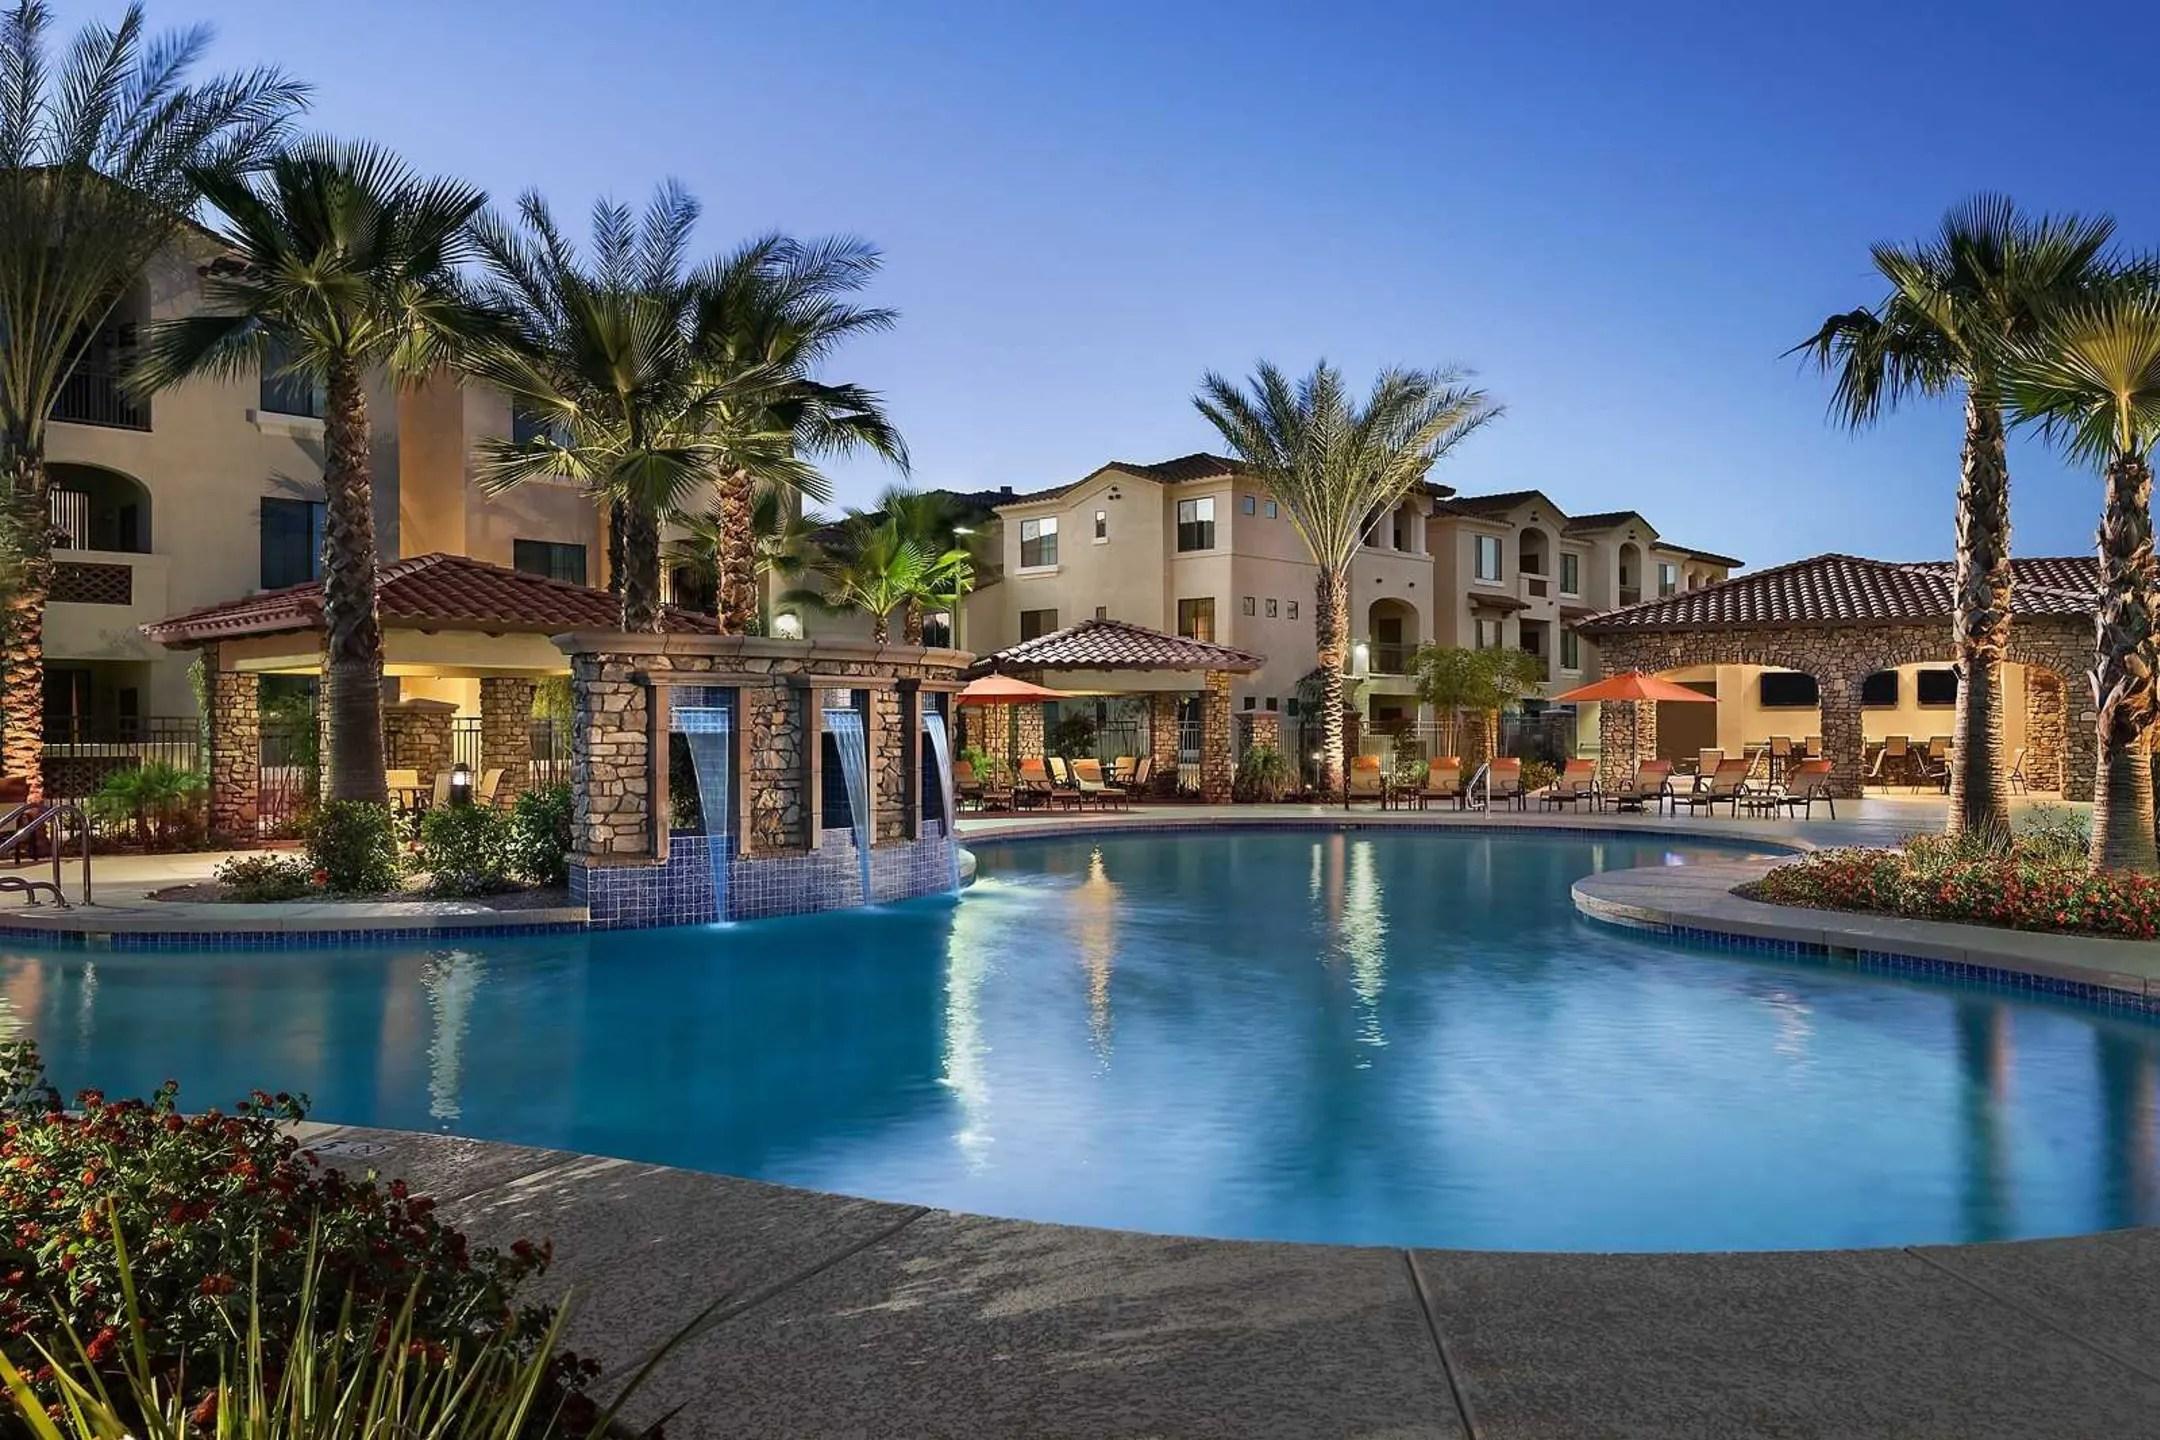 San Sonoma Apartments  Tempe AZ 85284